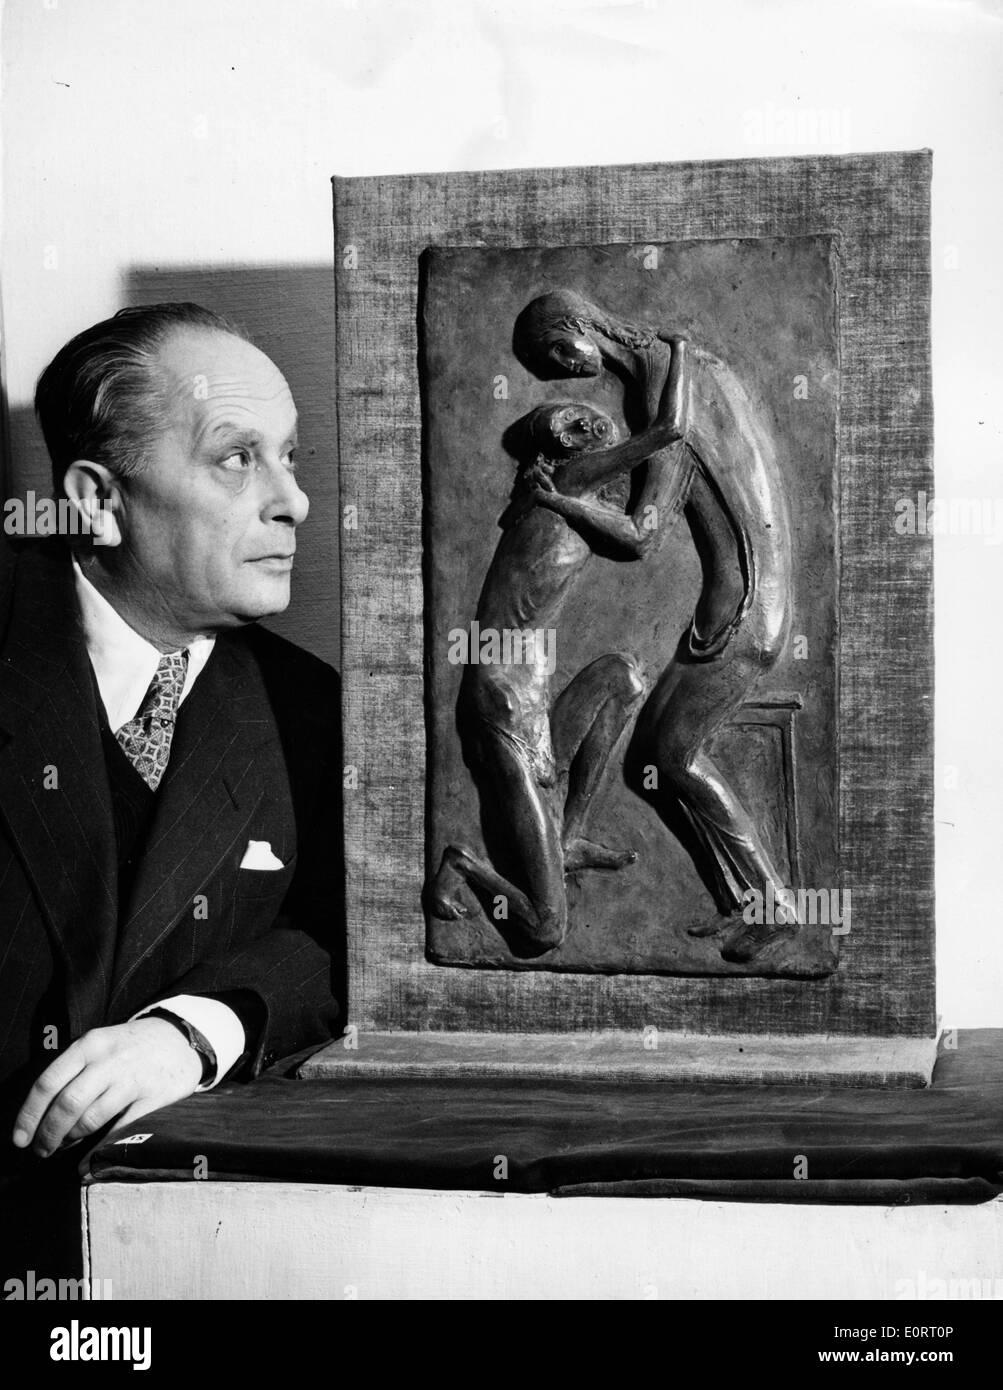 Artist Georg Ehrlich with work of art - Stock Image